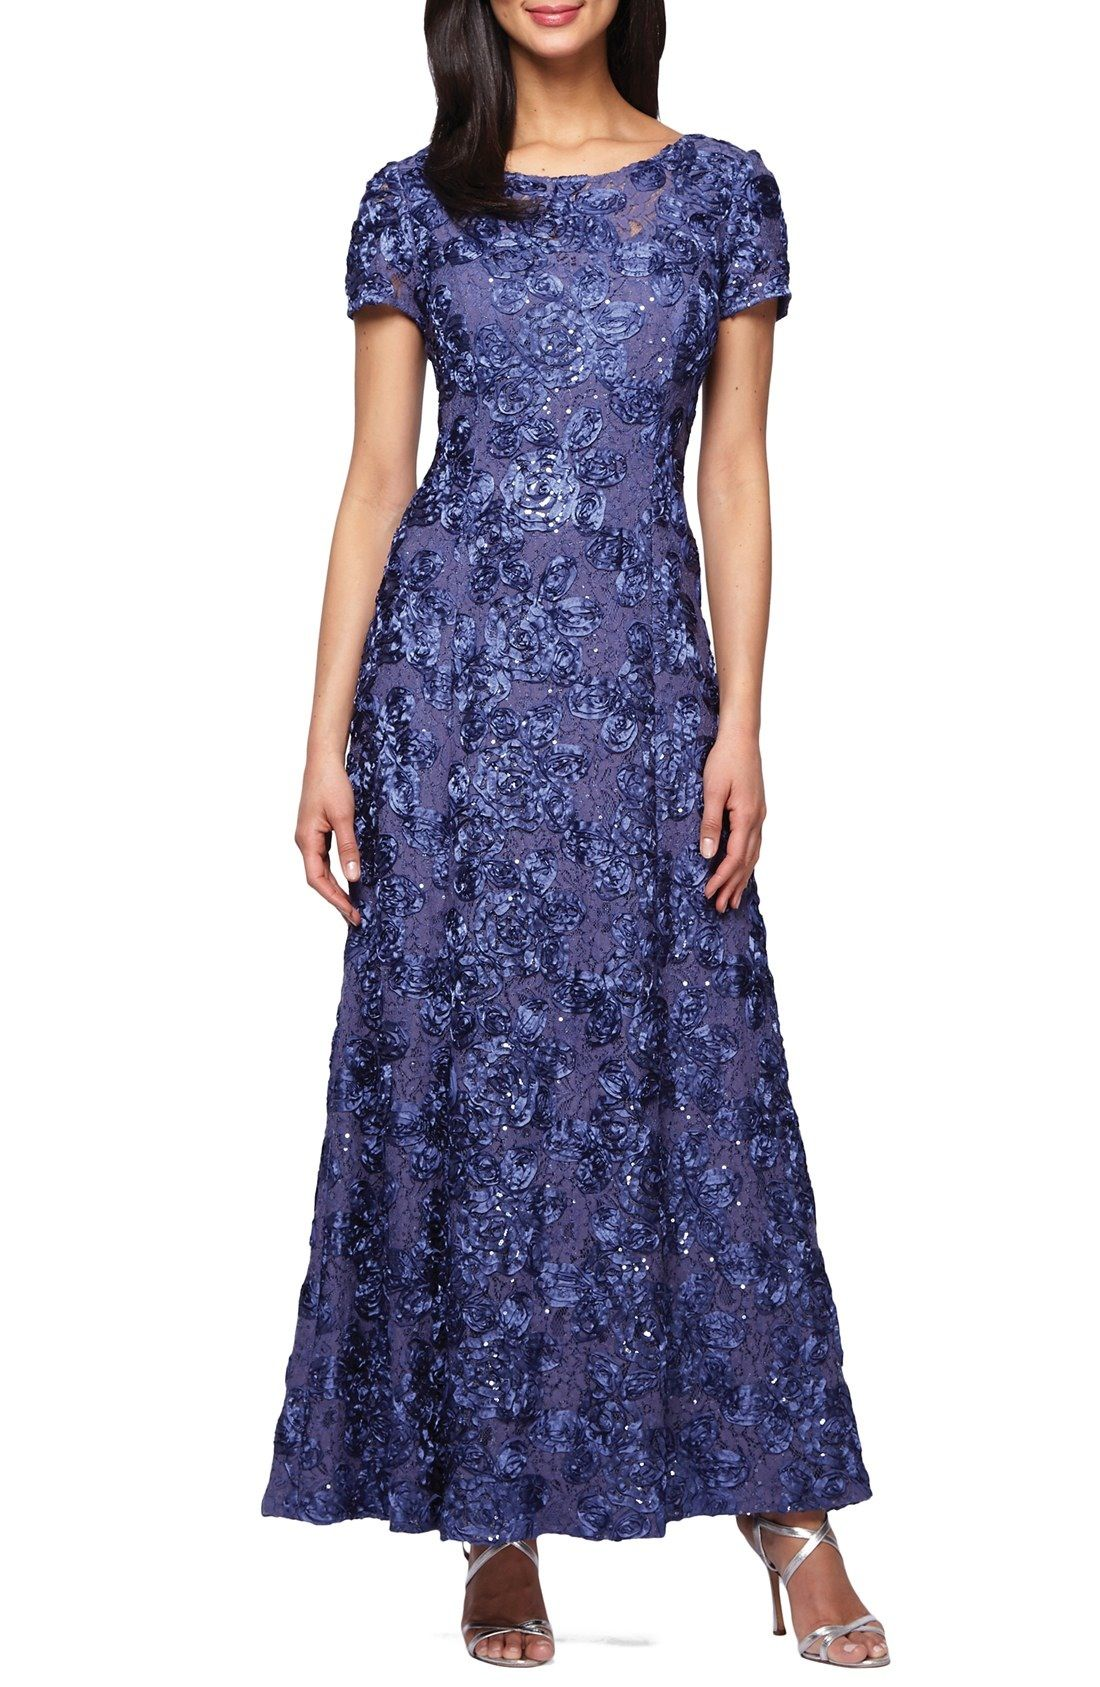 Alex Evenings Sequin | Beauty | Pinterest | Sequins, Petite and Gowns